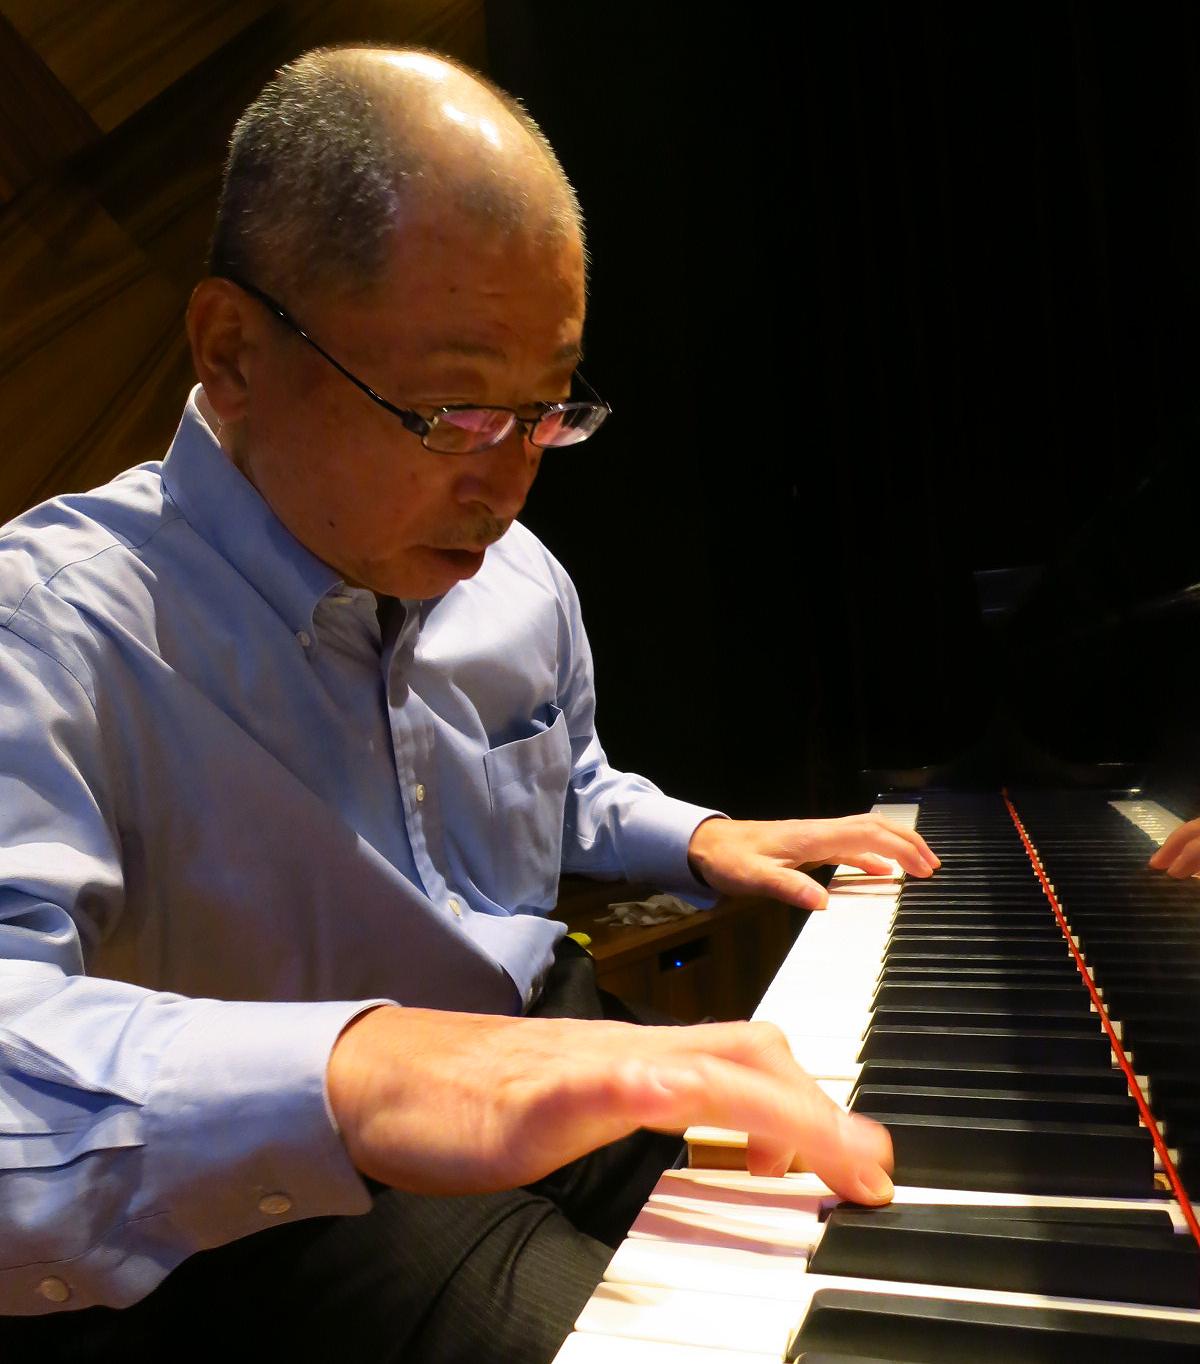 Ryo Fukui - Wikipedia